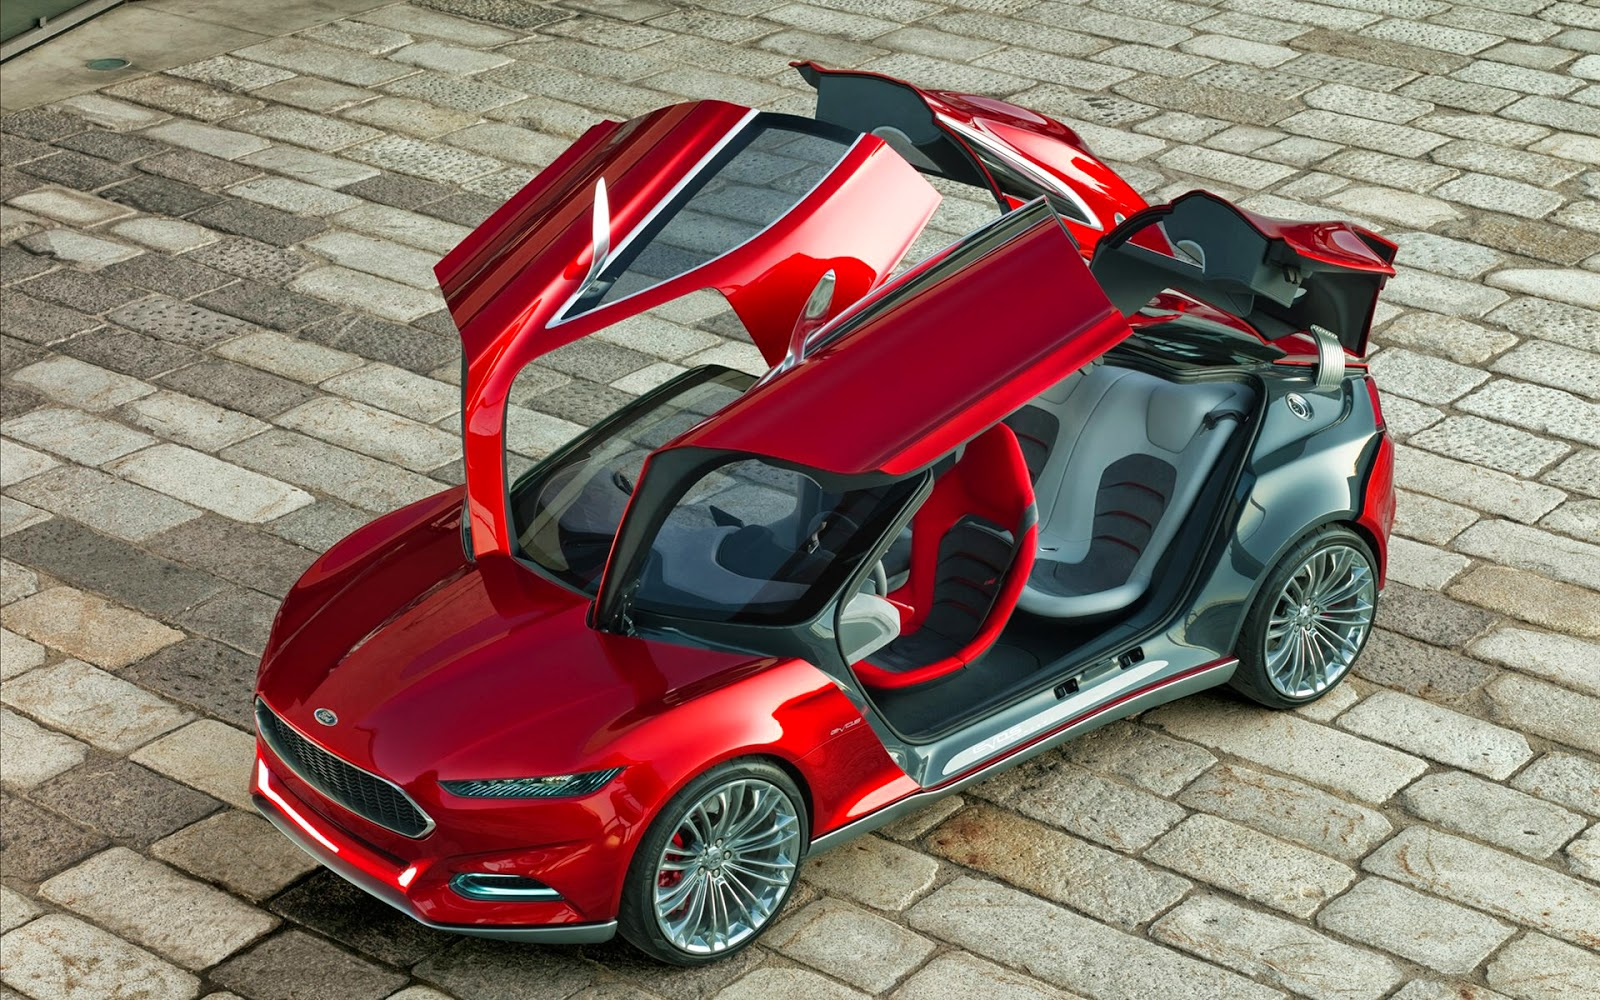 http://www.autocarsinfo.com/2014/08/ford-evos-concept-2012-free-wallpaper.html